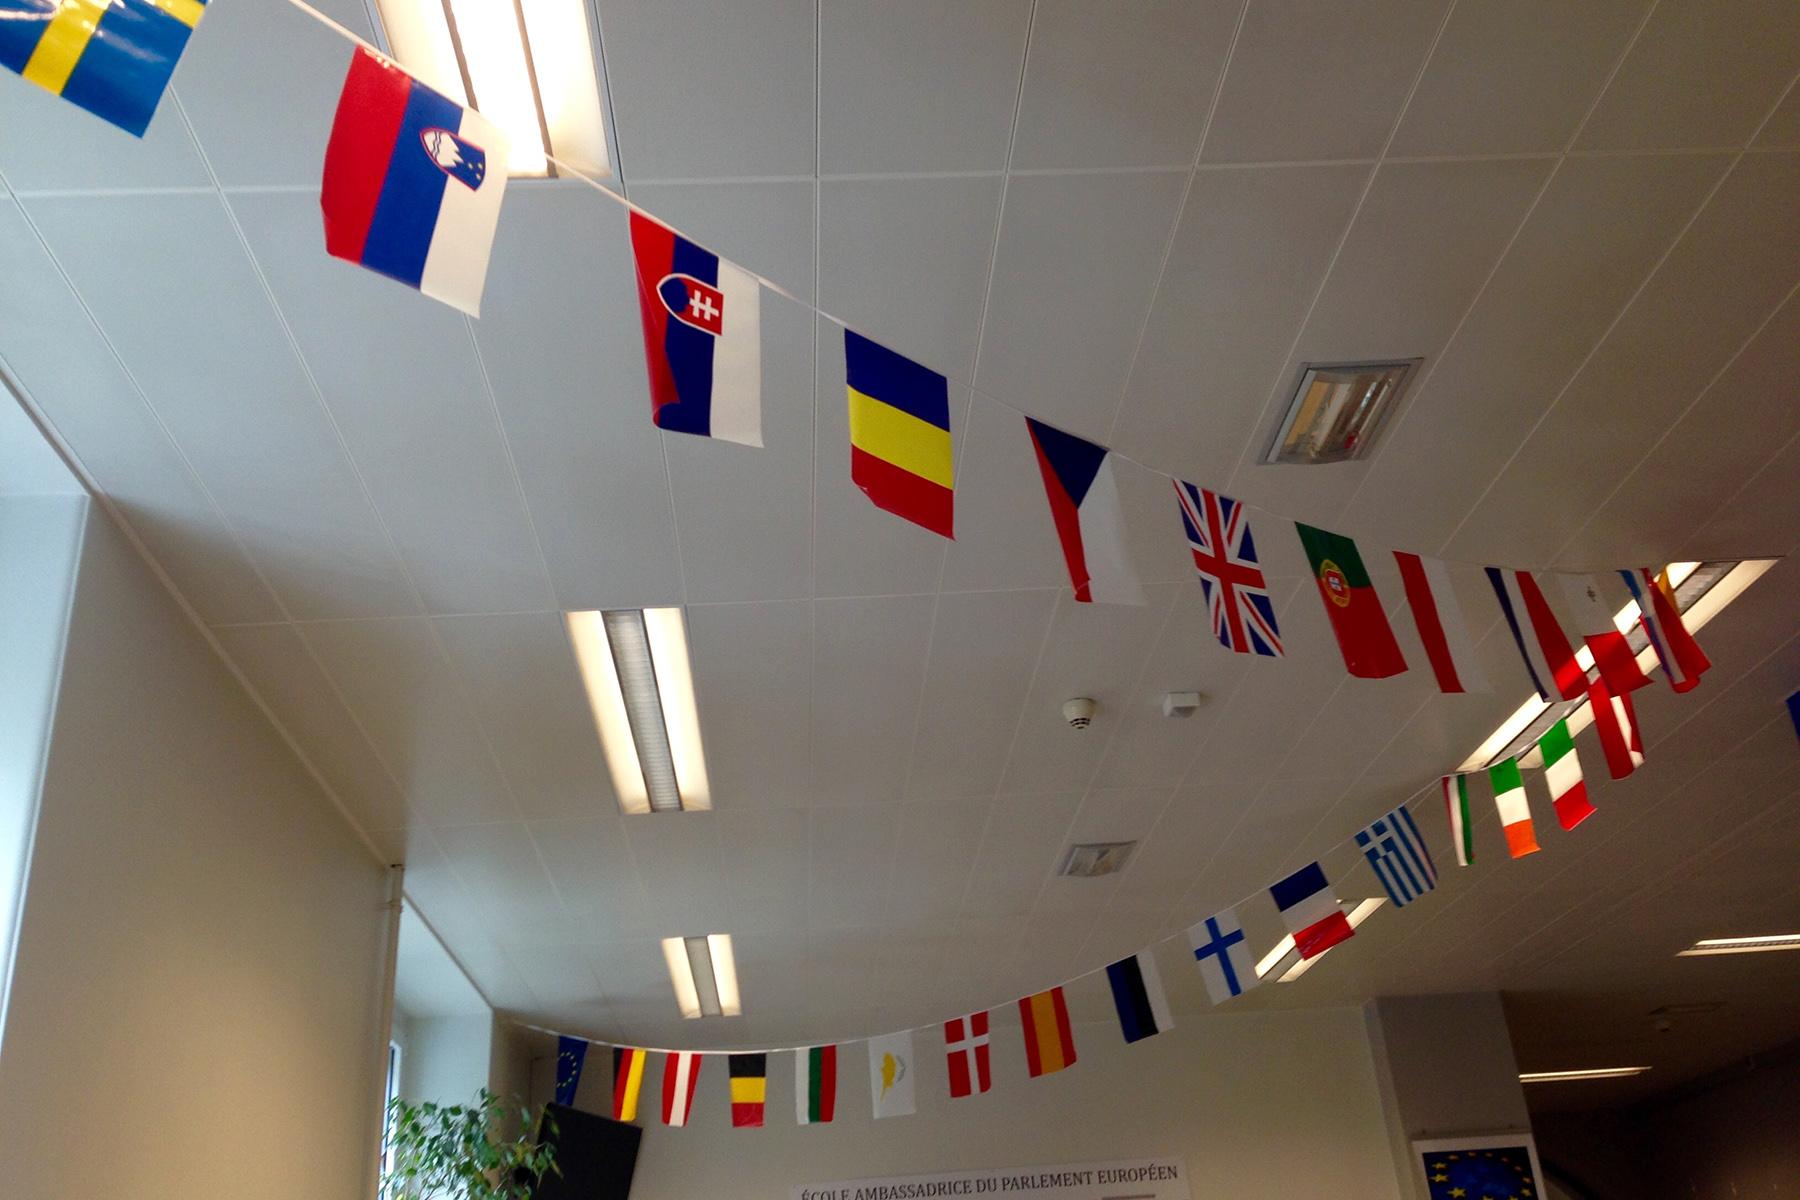 An international school classroom in Limpertsberg